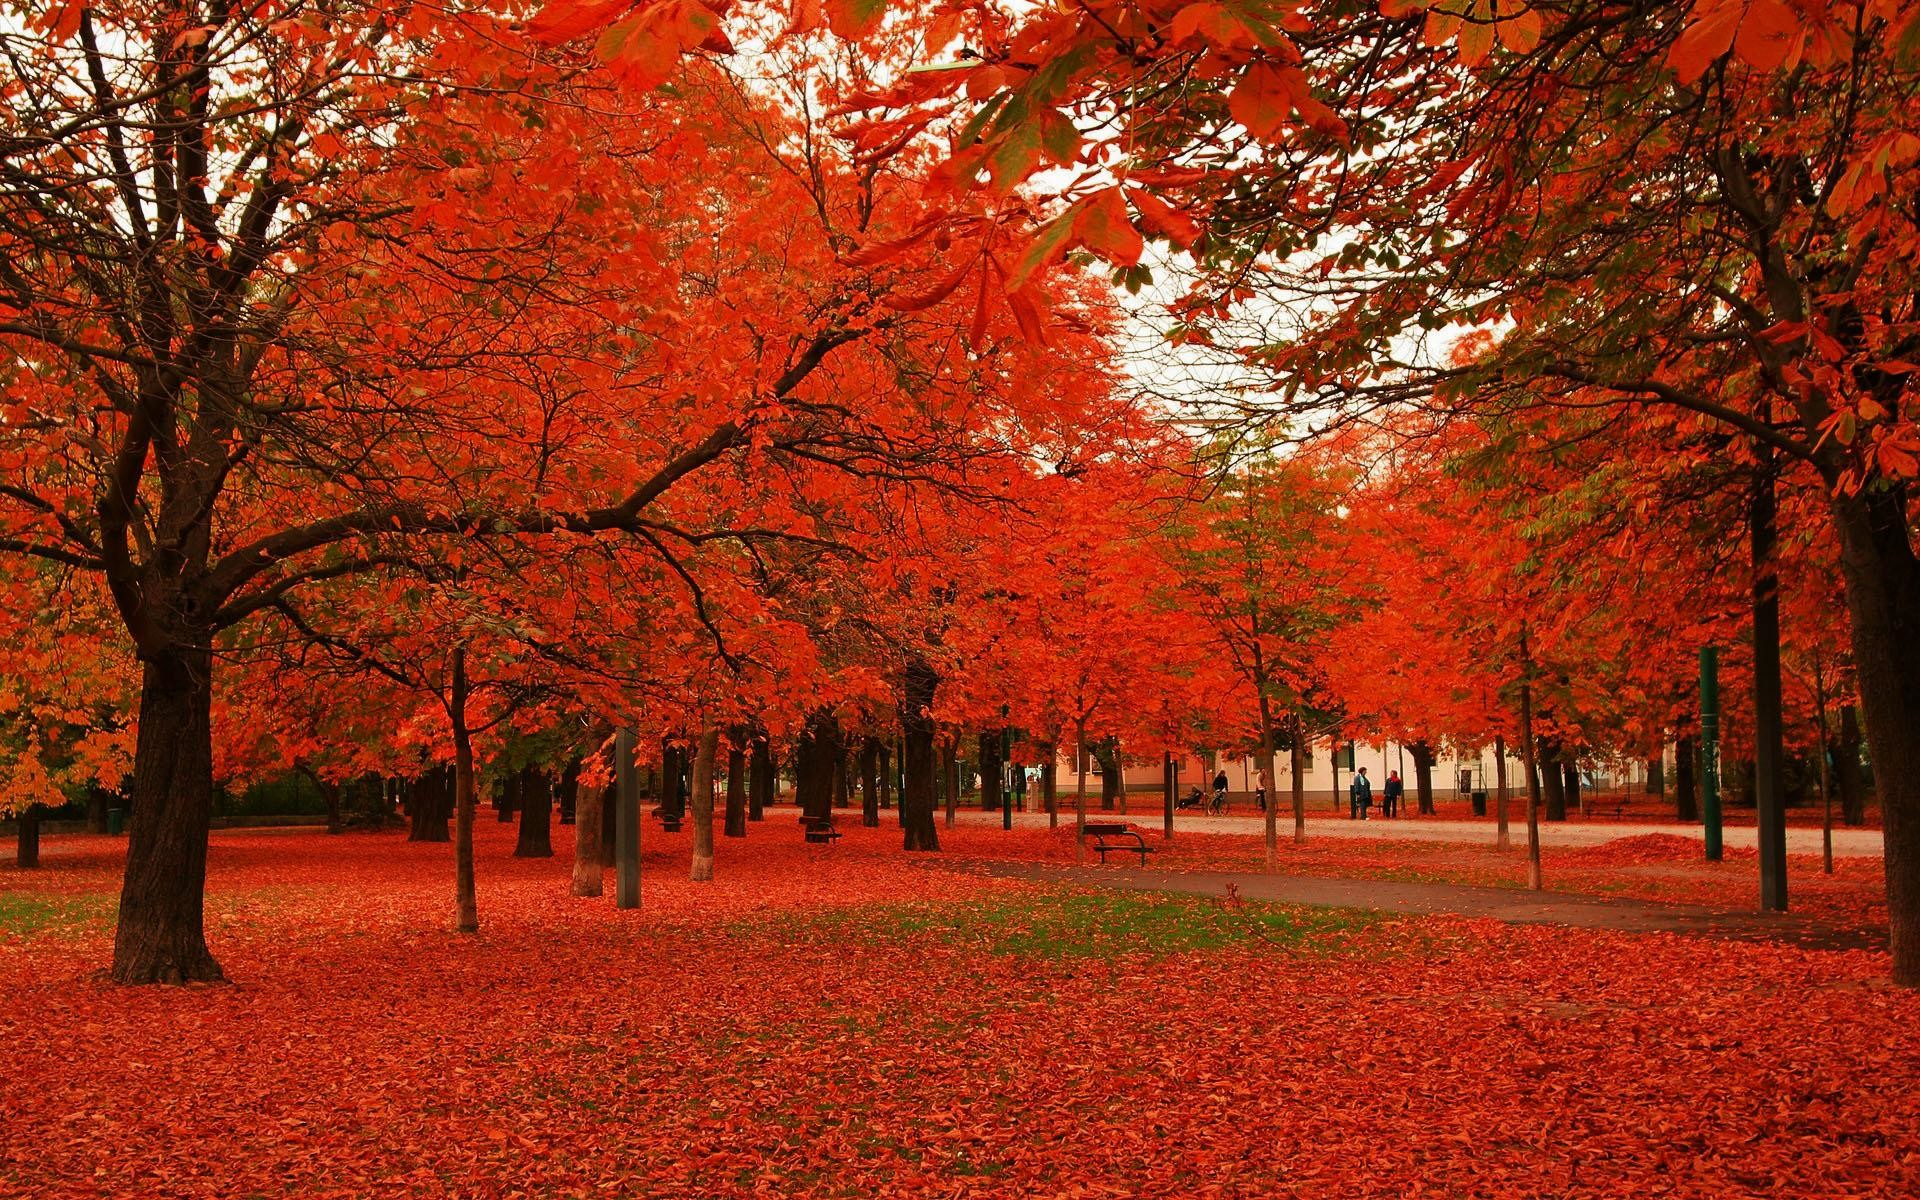 wallpaper.wiki-Fall-Foliage-Image-Download-Free-PIC-